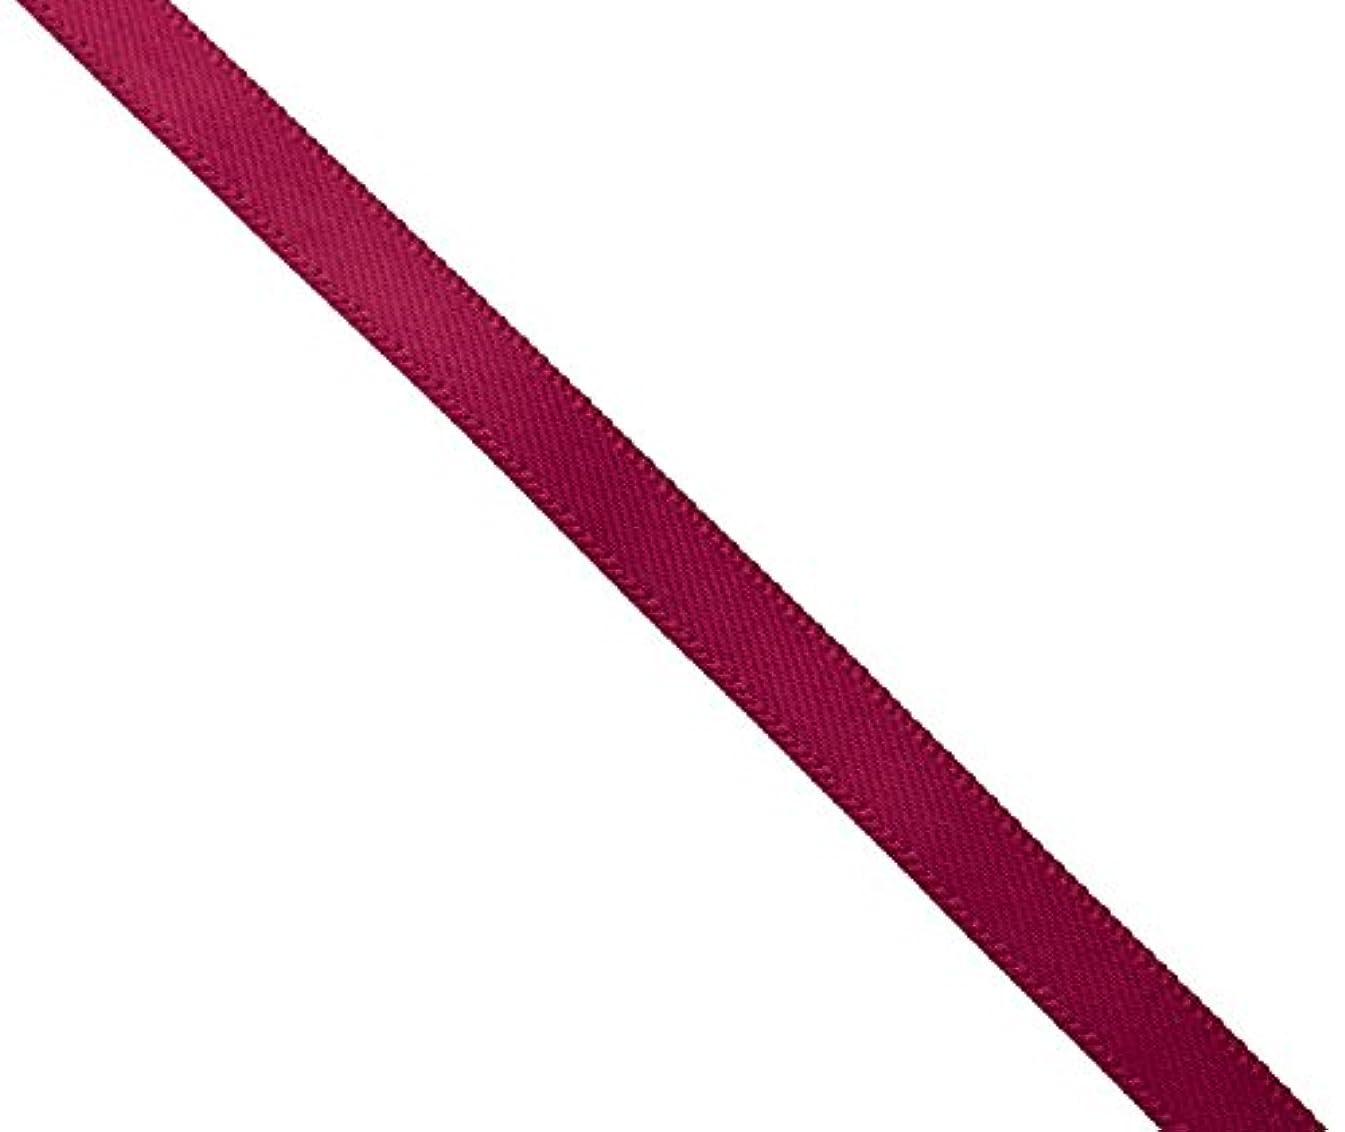 Kel-Toy Double Face Satin Ribbon, 3/8-Inch by 100-Yard, Burgundy